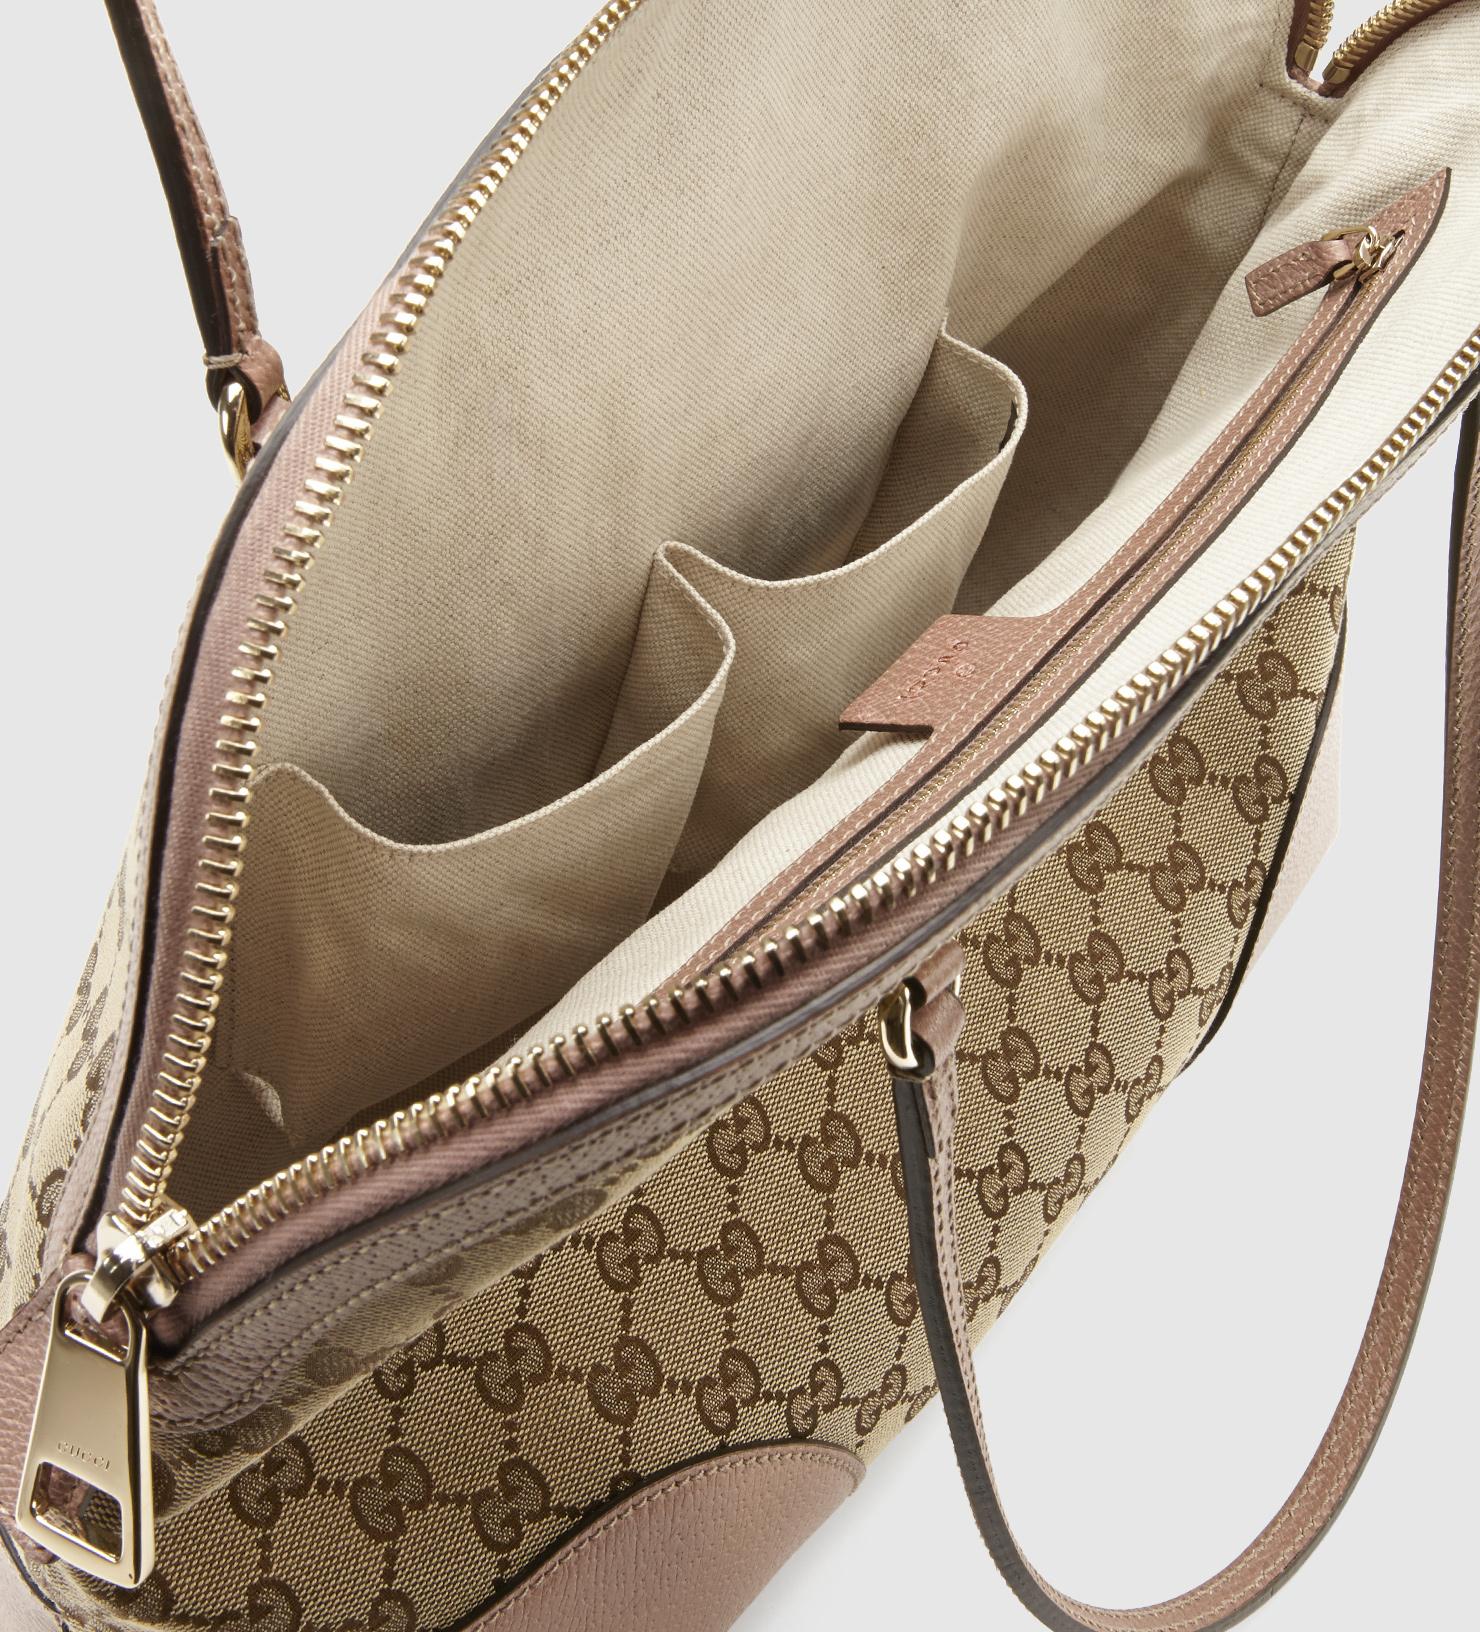 6413bfcb72646f Gucci Bree Original Gg Canvas Shoulder Bag in Natural - Lyst